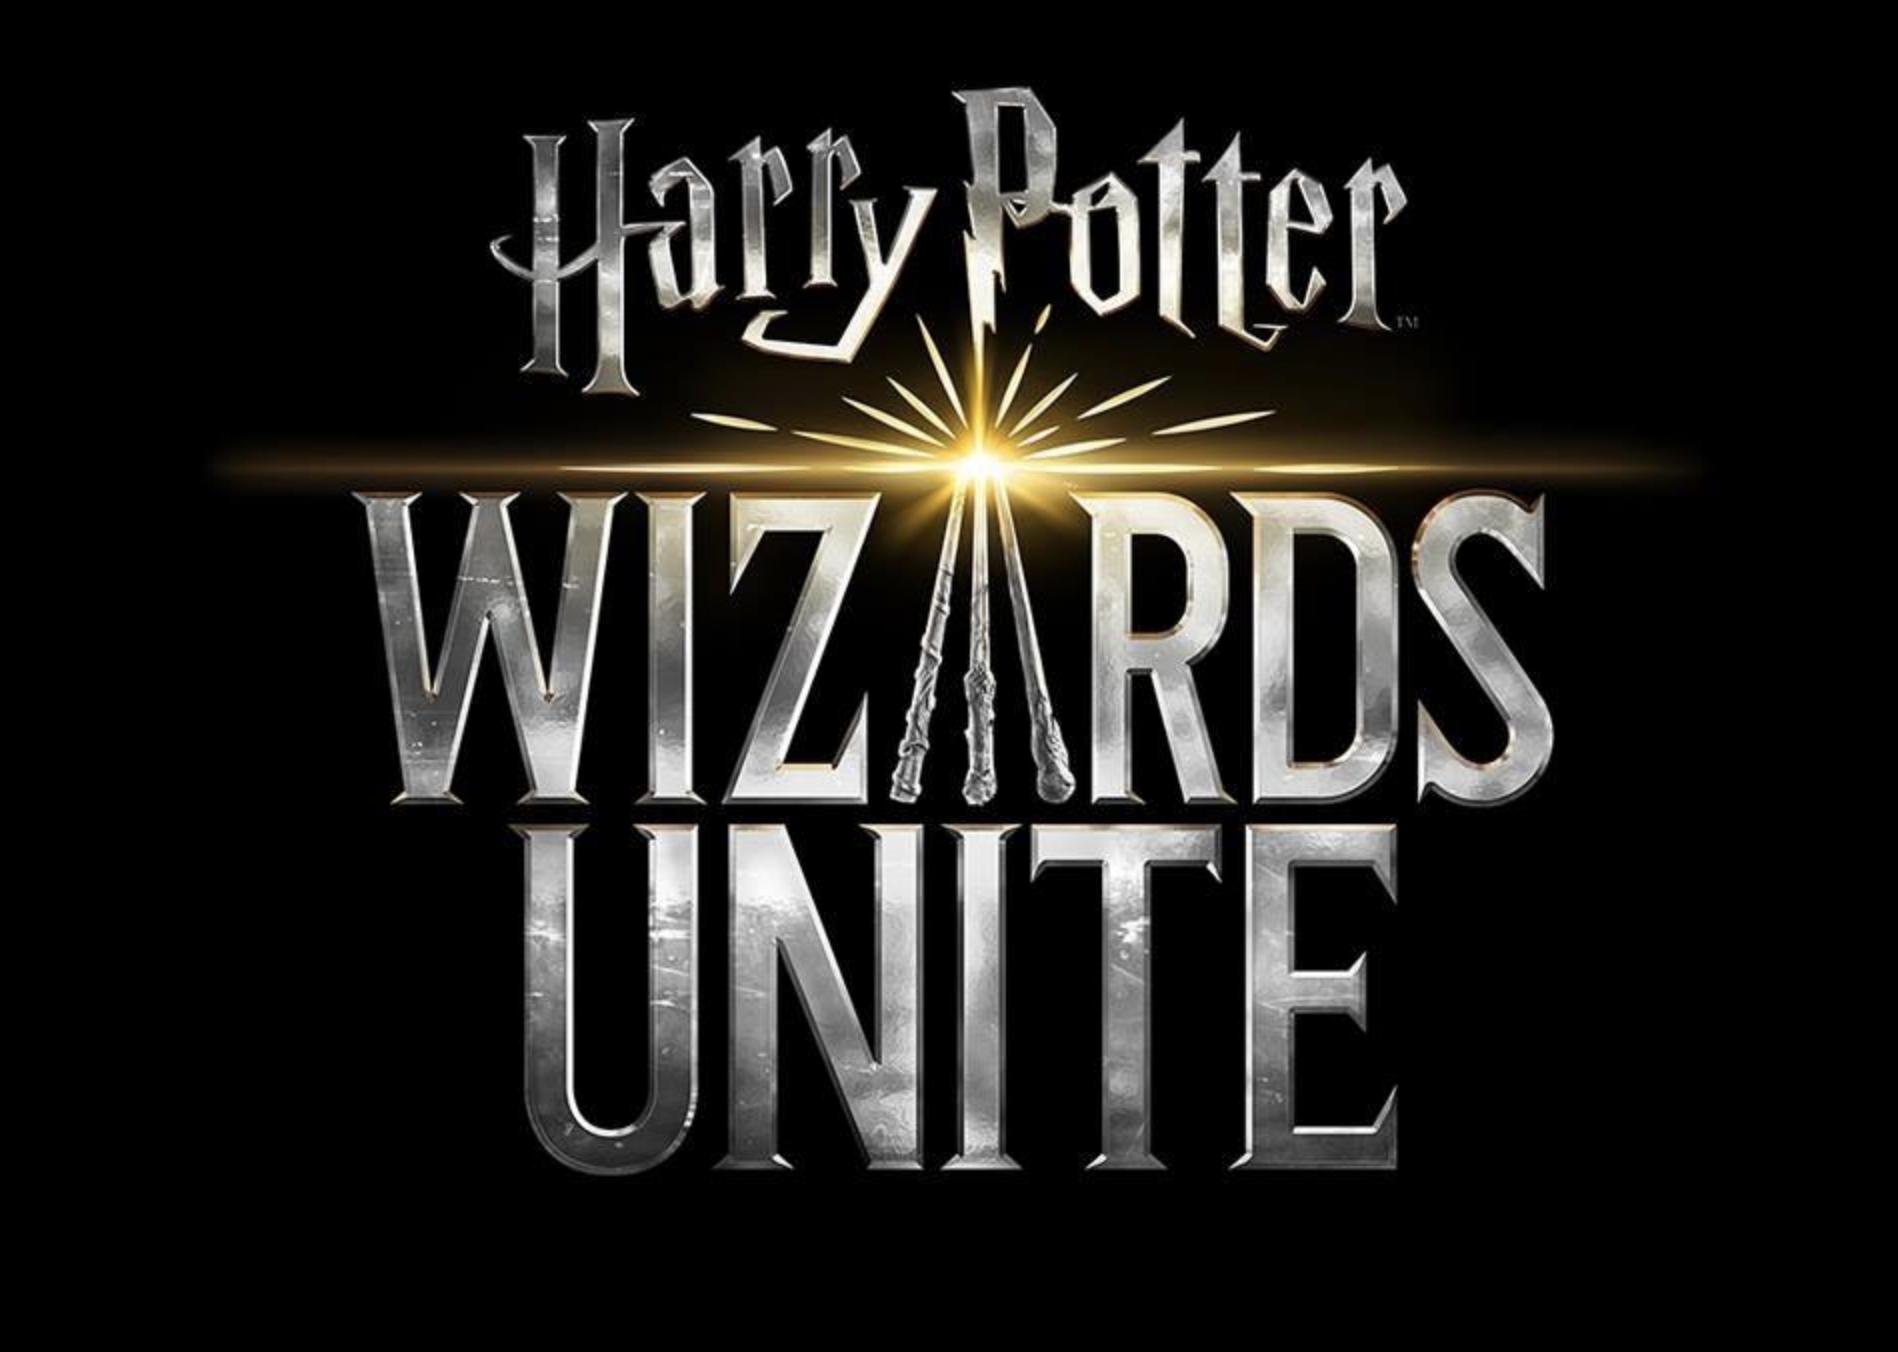 "<p><strong>Фото © Facebook/</strong><a href=""https://www.facebook.com/HPWizardsUnite/?tn-str=k%2AF"" target=""_self""><strong>Harry Potter: Wizards Unite</strong></a></p>"